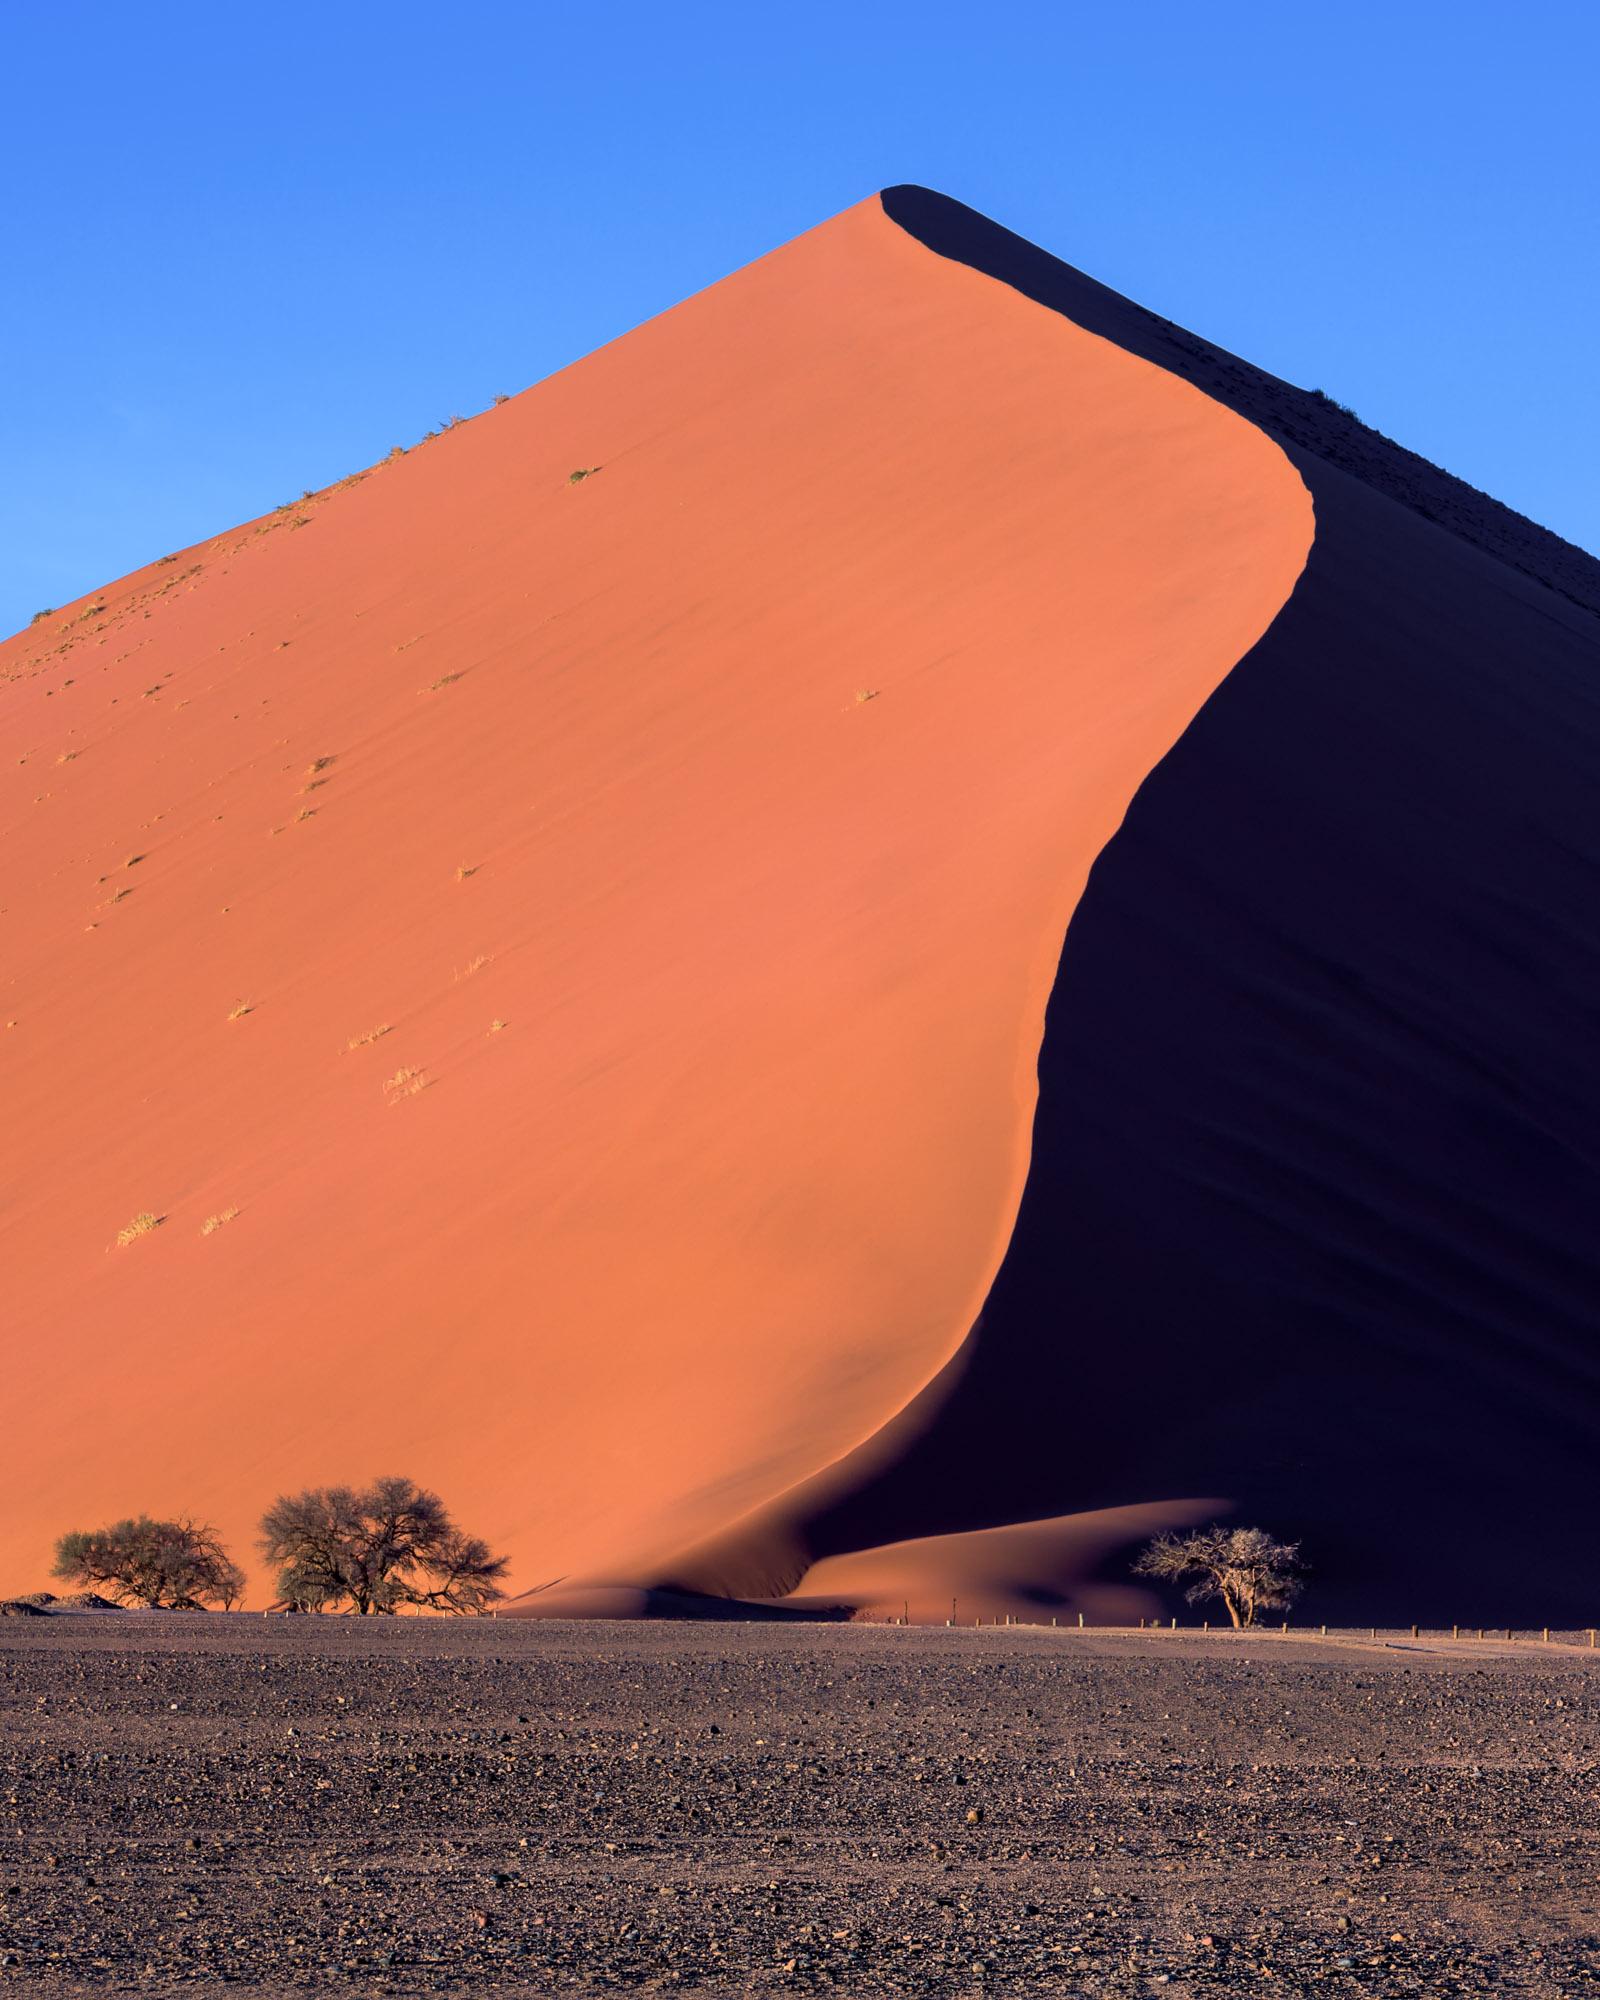 Dune 44, Sossusvlei, Namib-Naukluft Park, Namibia